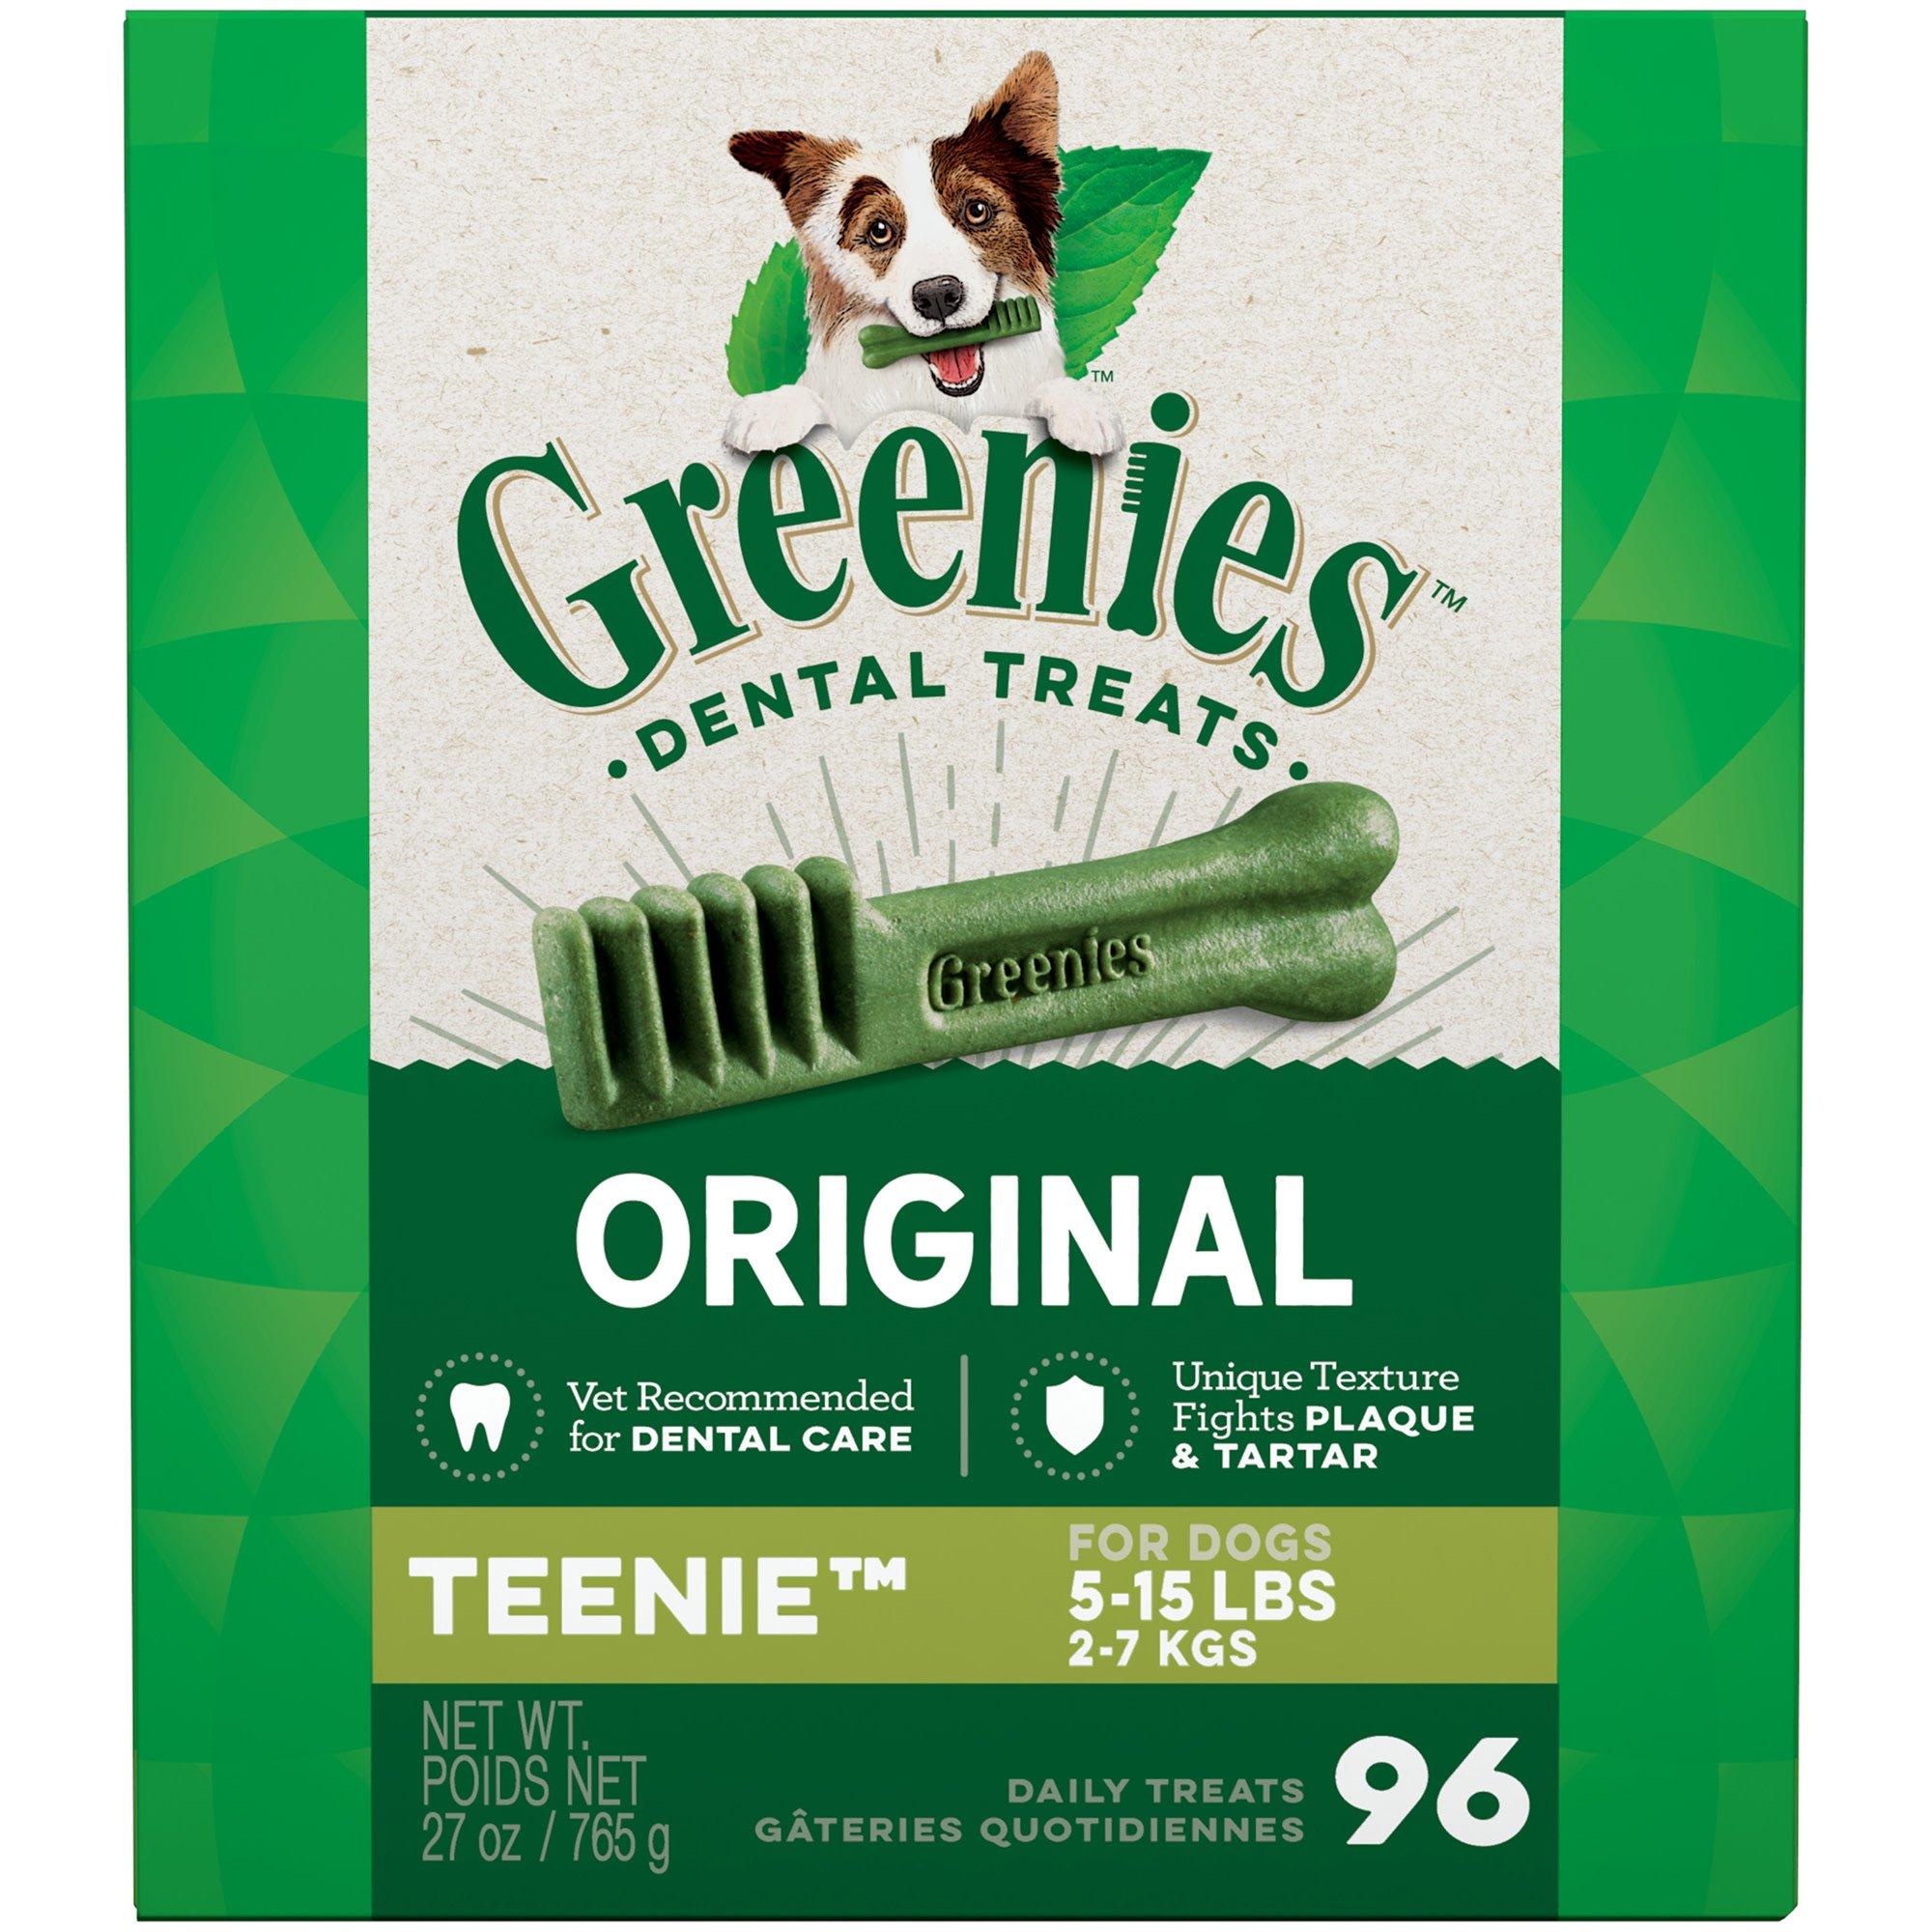 Greenies Original Teenie Dental Dog Treats, 96-count